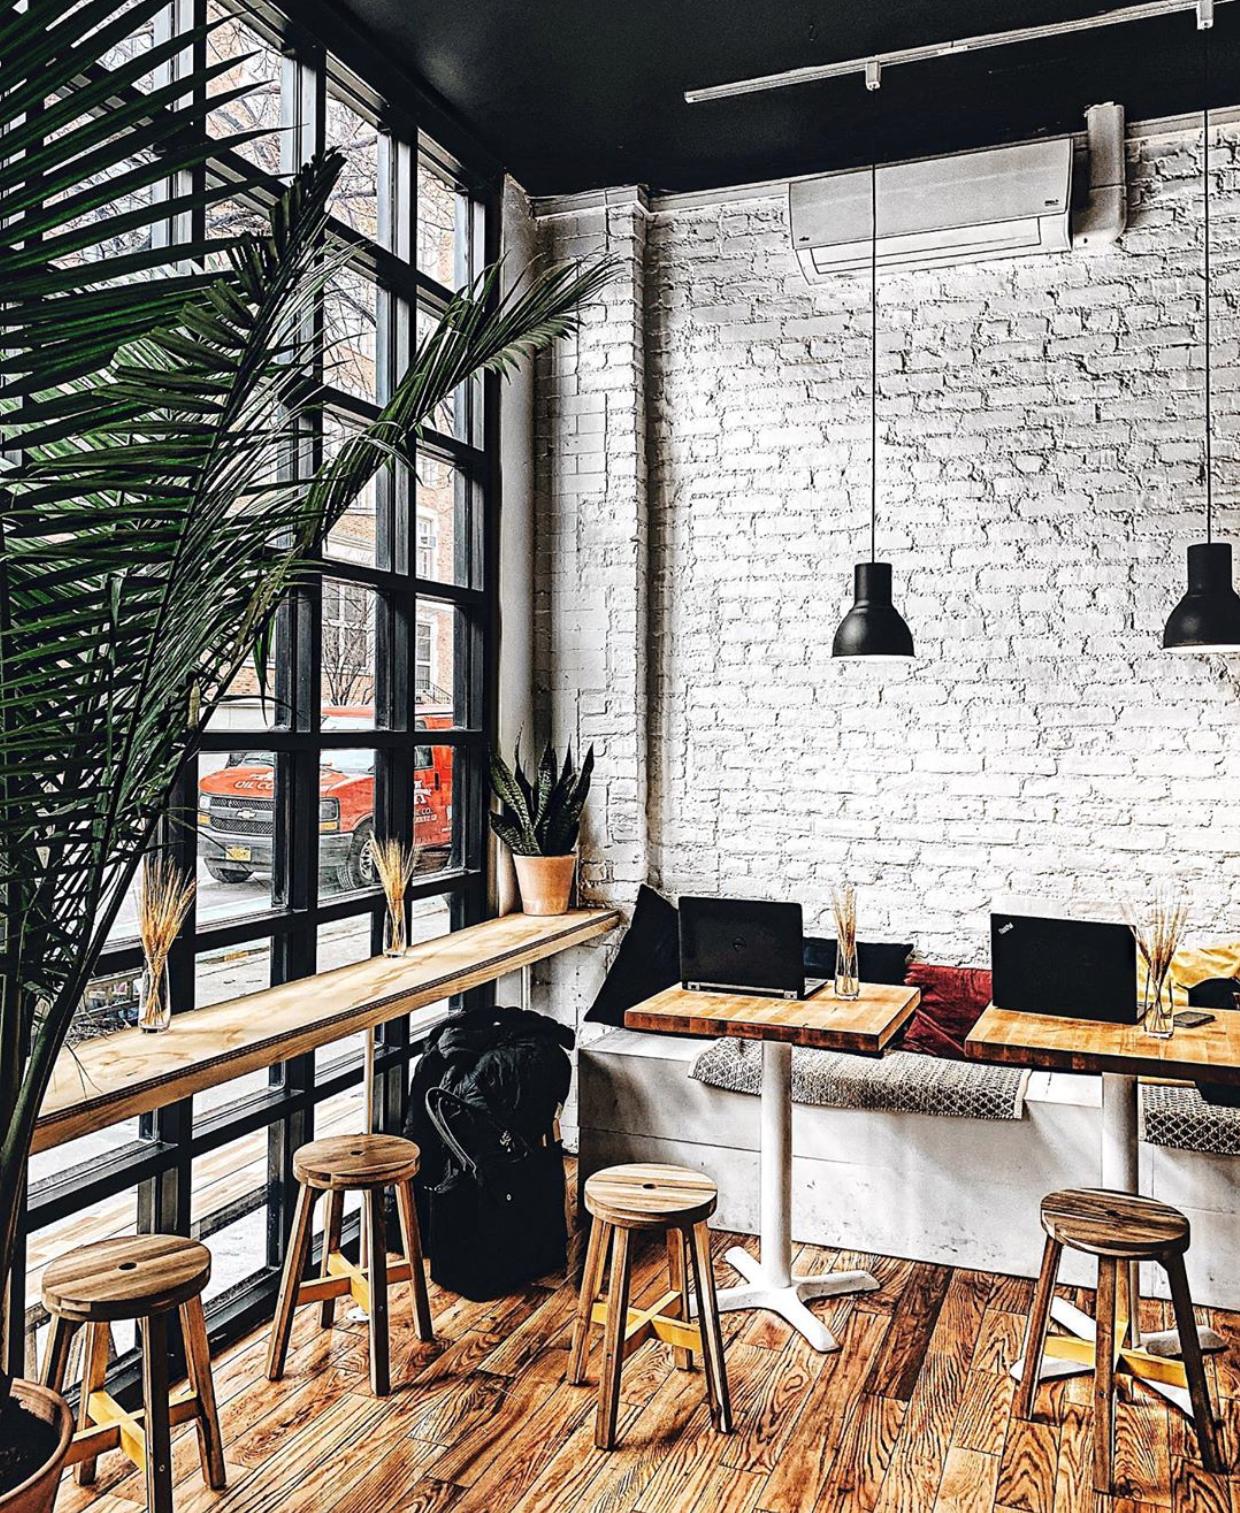 Interior Store Design Coffee House In 2020 Coffee Shop Decor Cafe Interior Design Coffee House Interiors